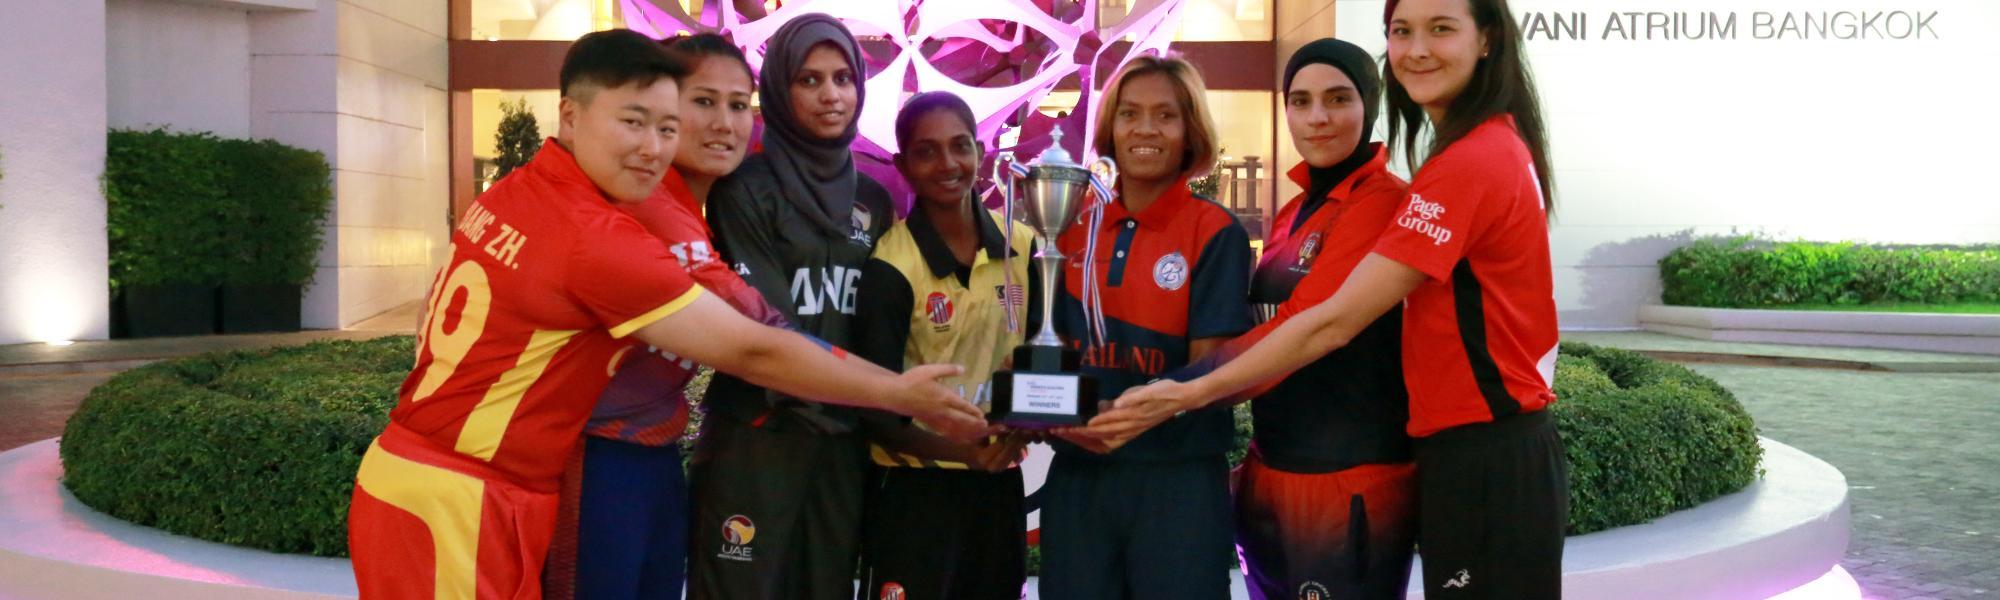 Women's T20 World Cup Asia Qualifier